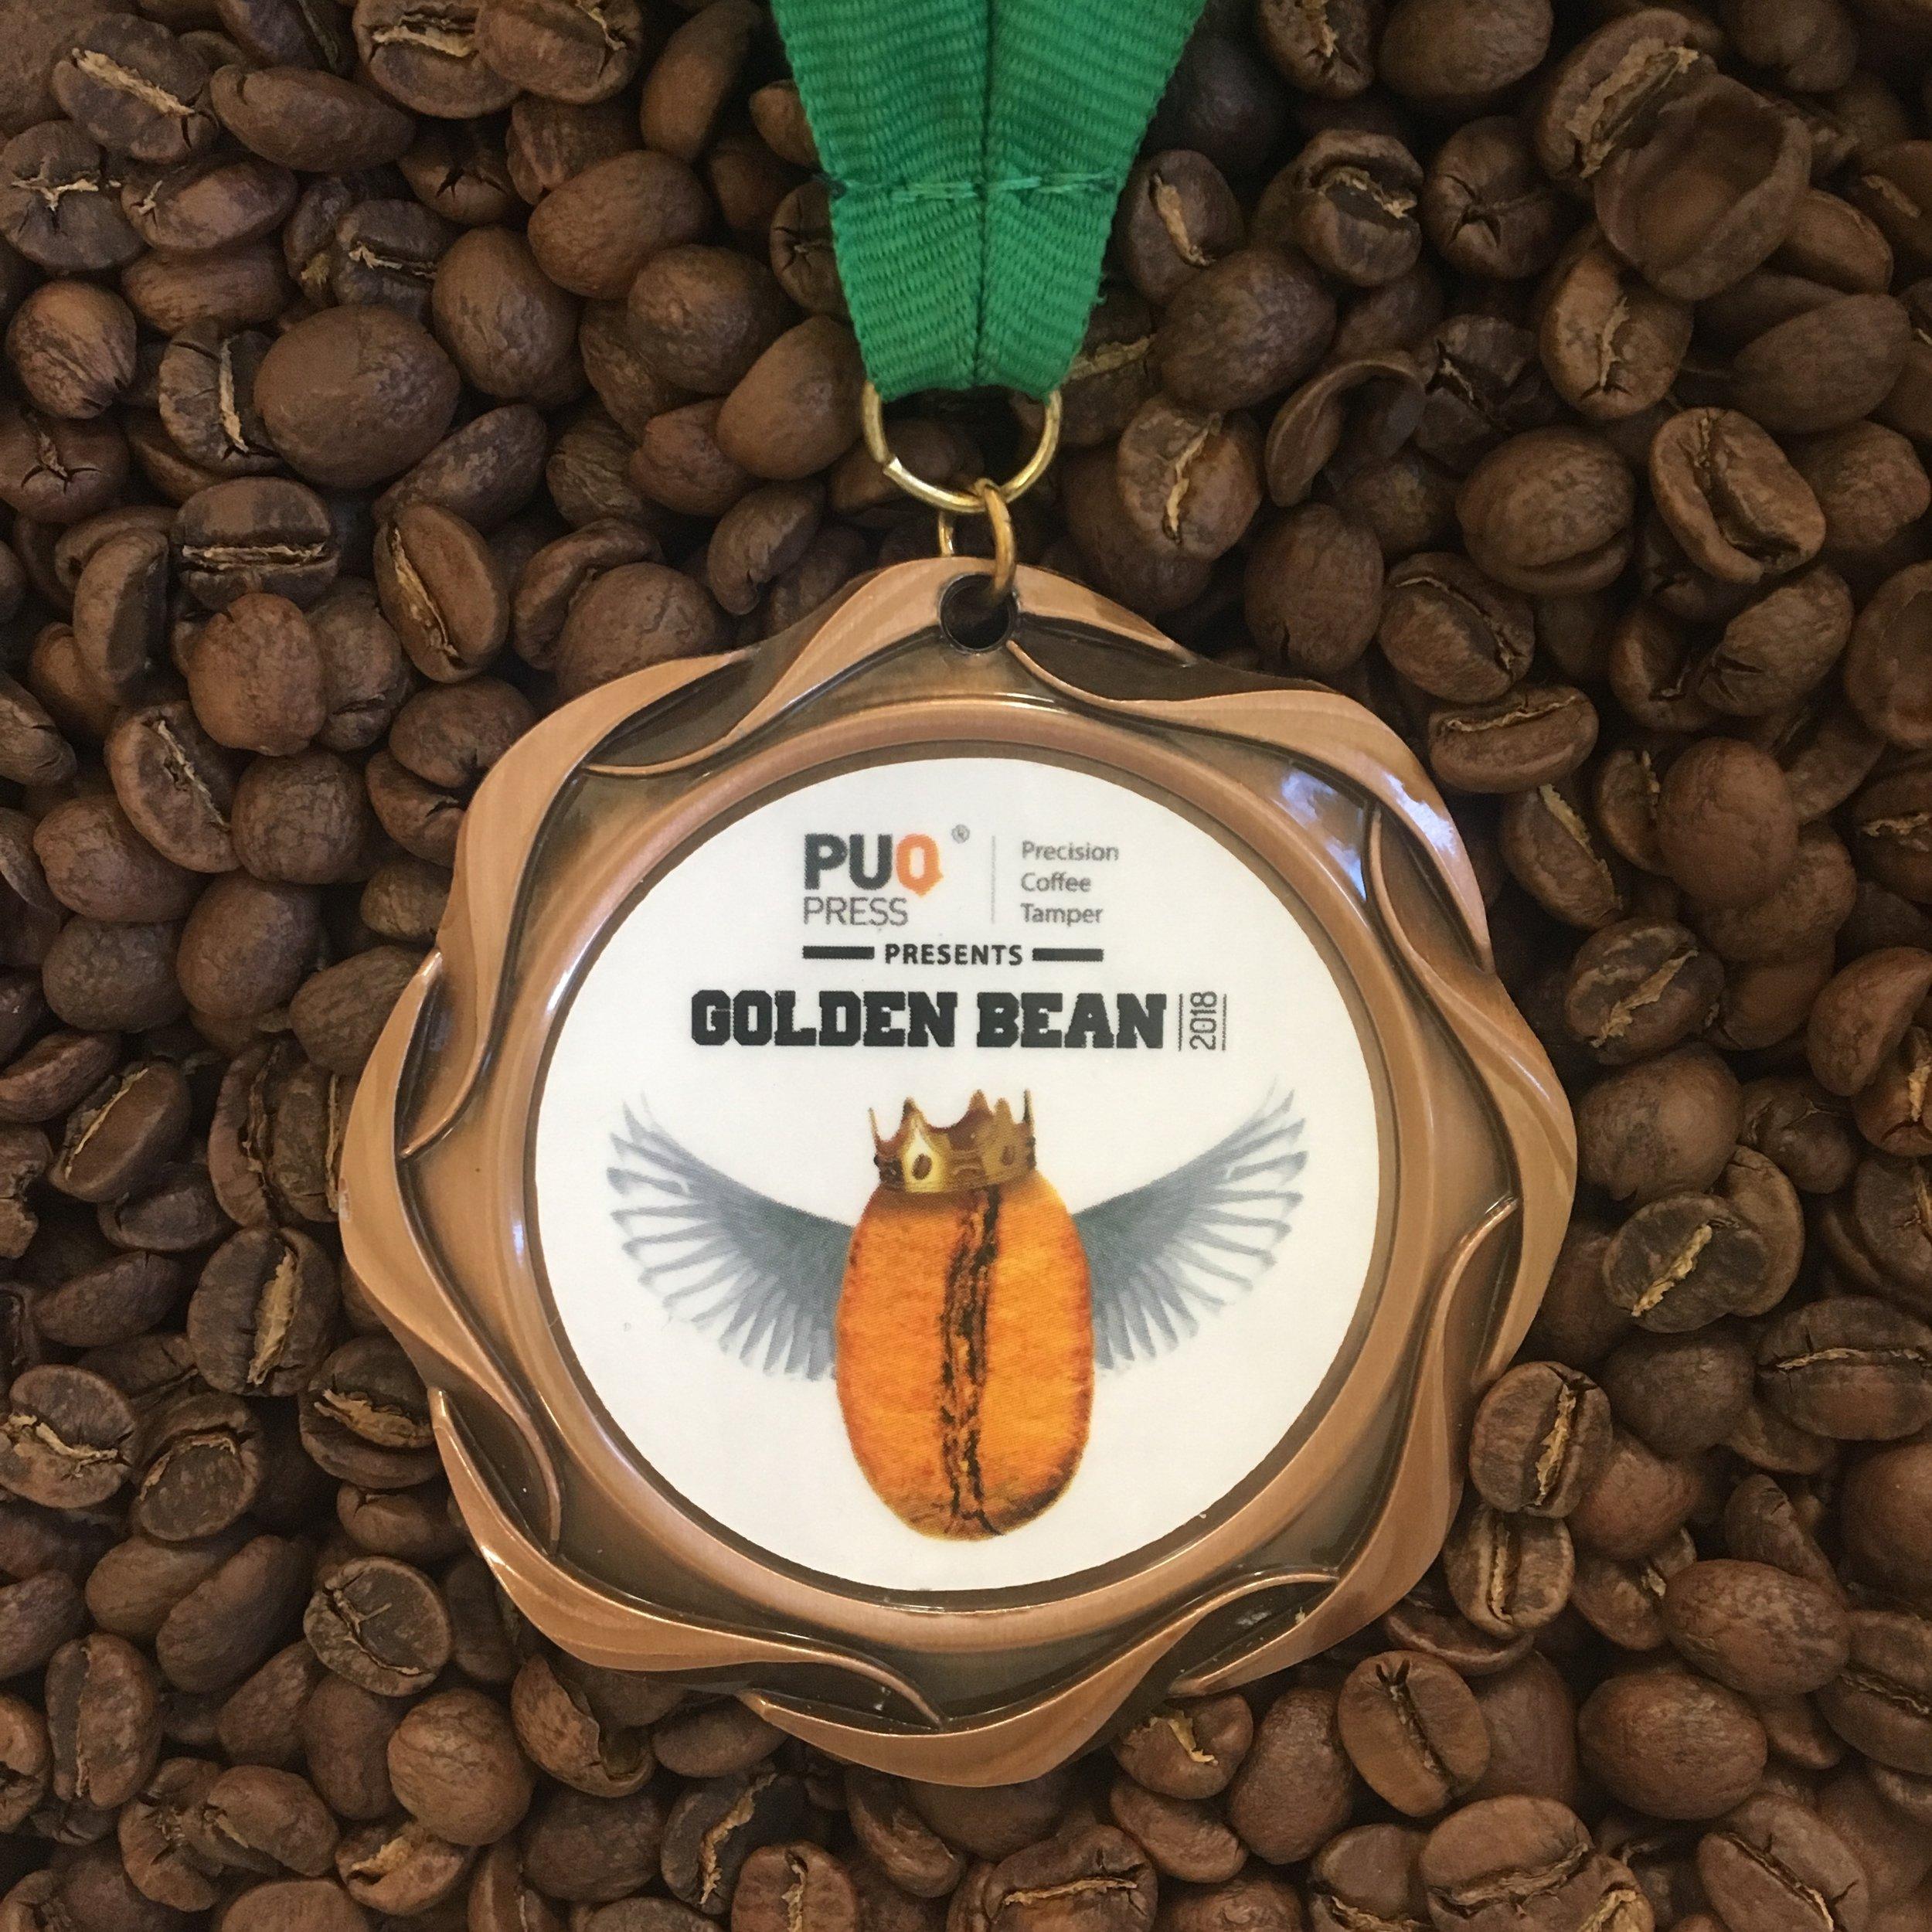 golden-bean-award-tanzania.jpg